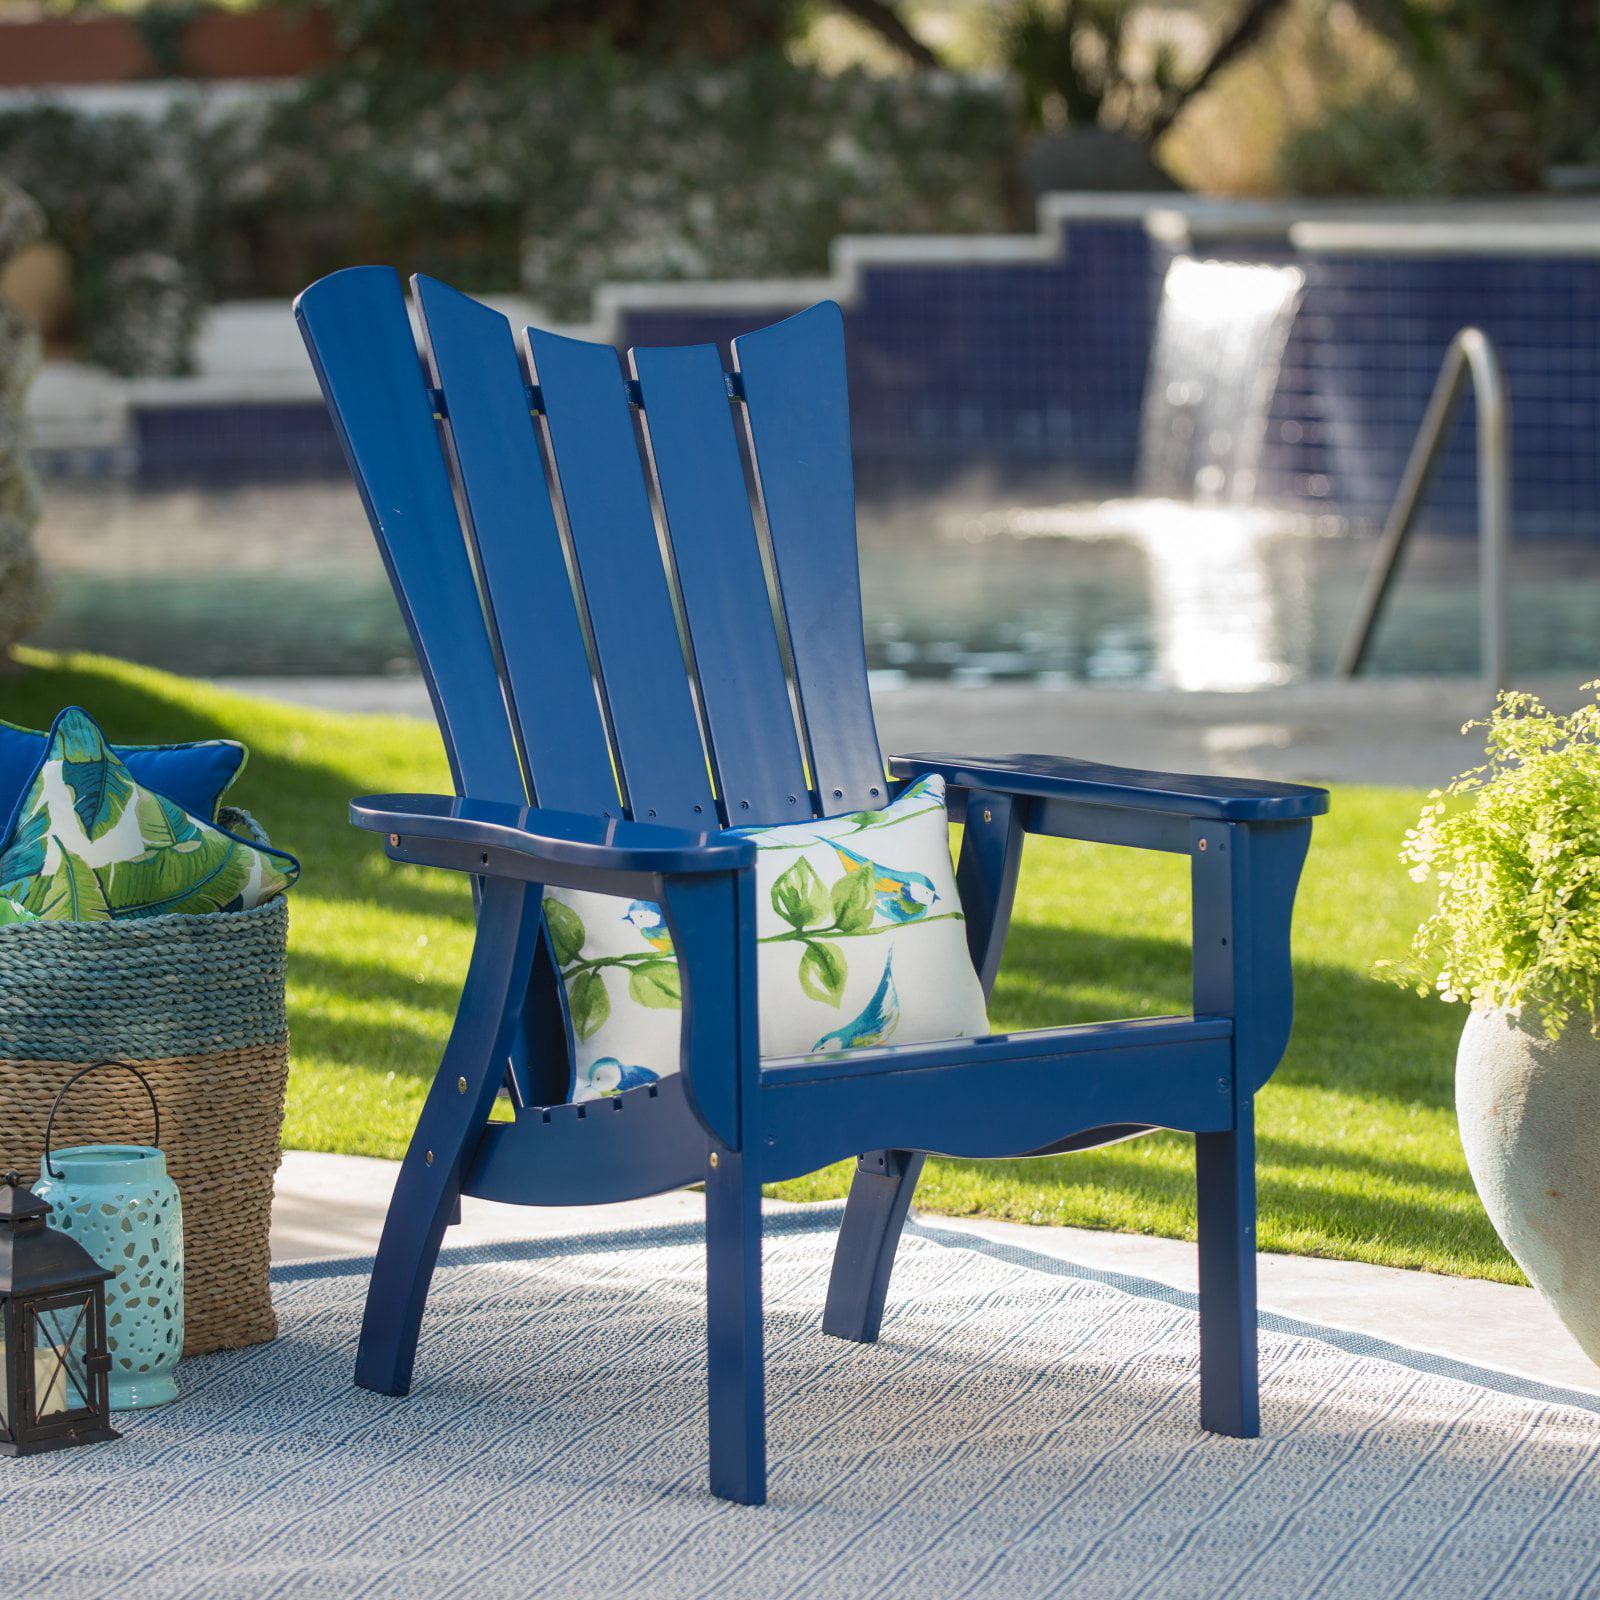 Belham Living Ocean Wave Adirondack Chair - Cobalt